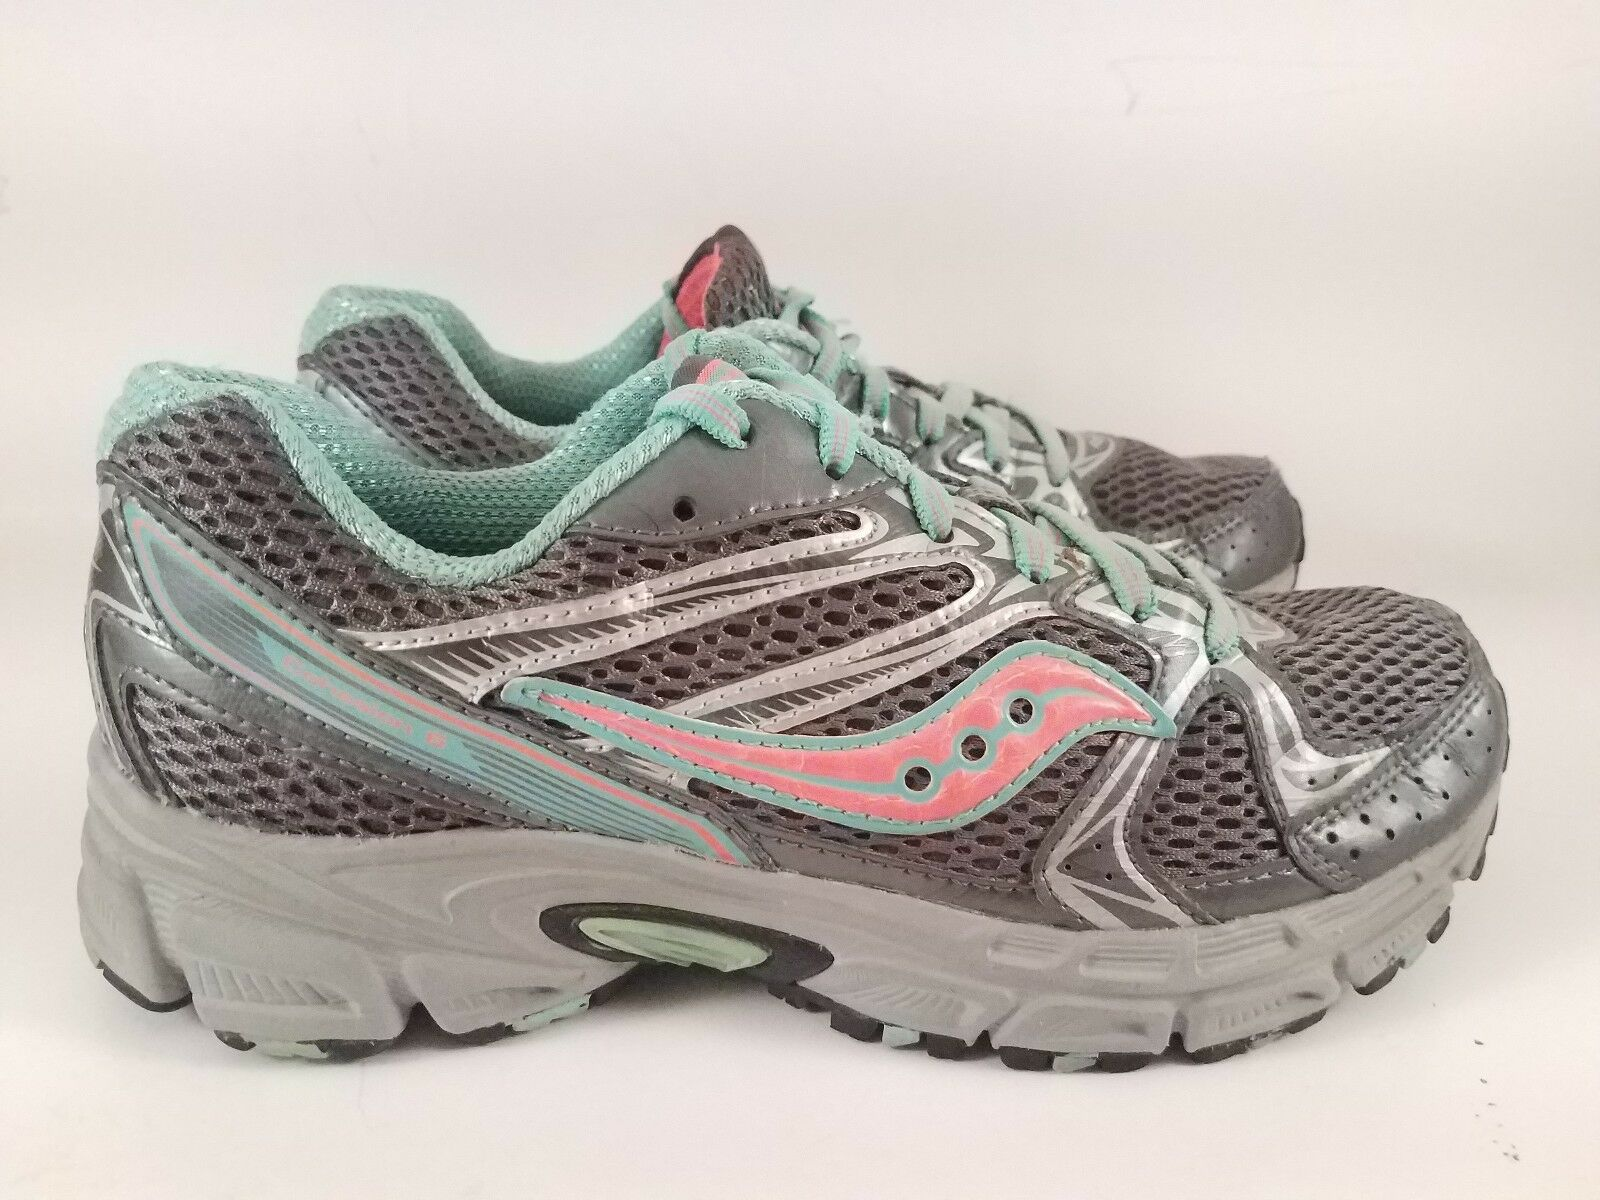 LA Sportiva shoes Sneakers Lace Up Morpho Dynamic Frixion Womens 7.5 39 EU